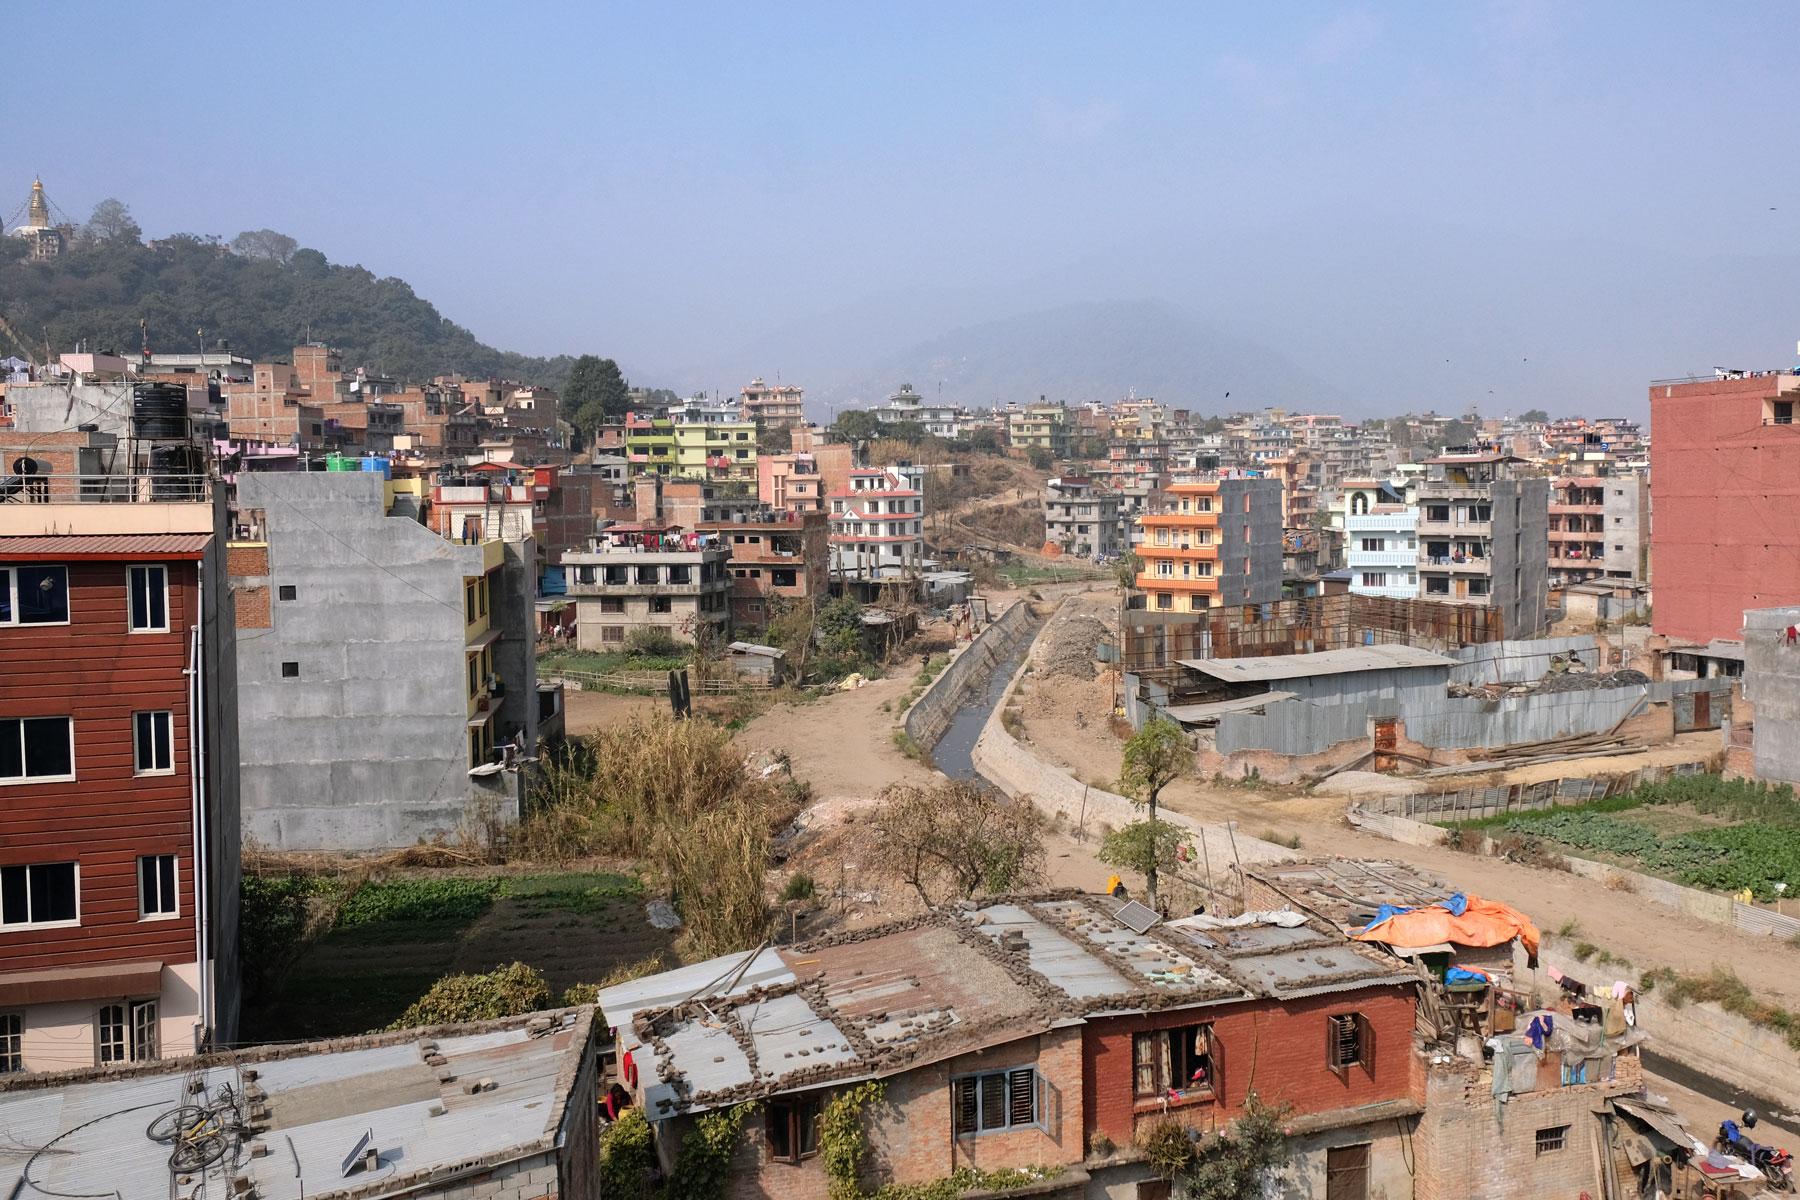 Wohnhäuser in Kathmandu.